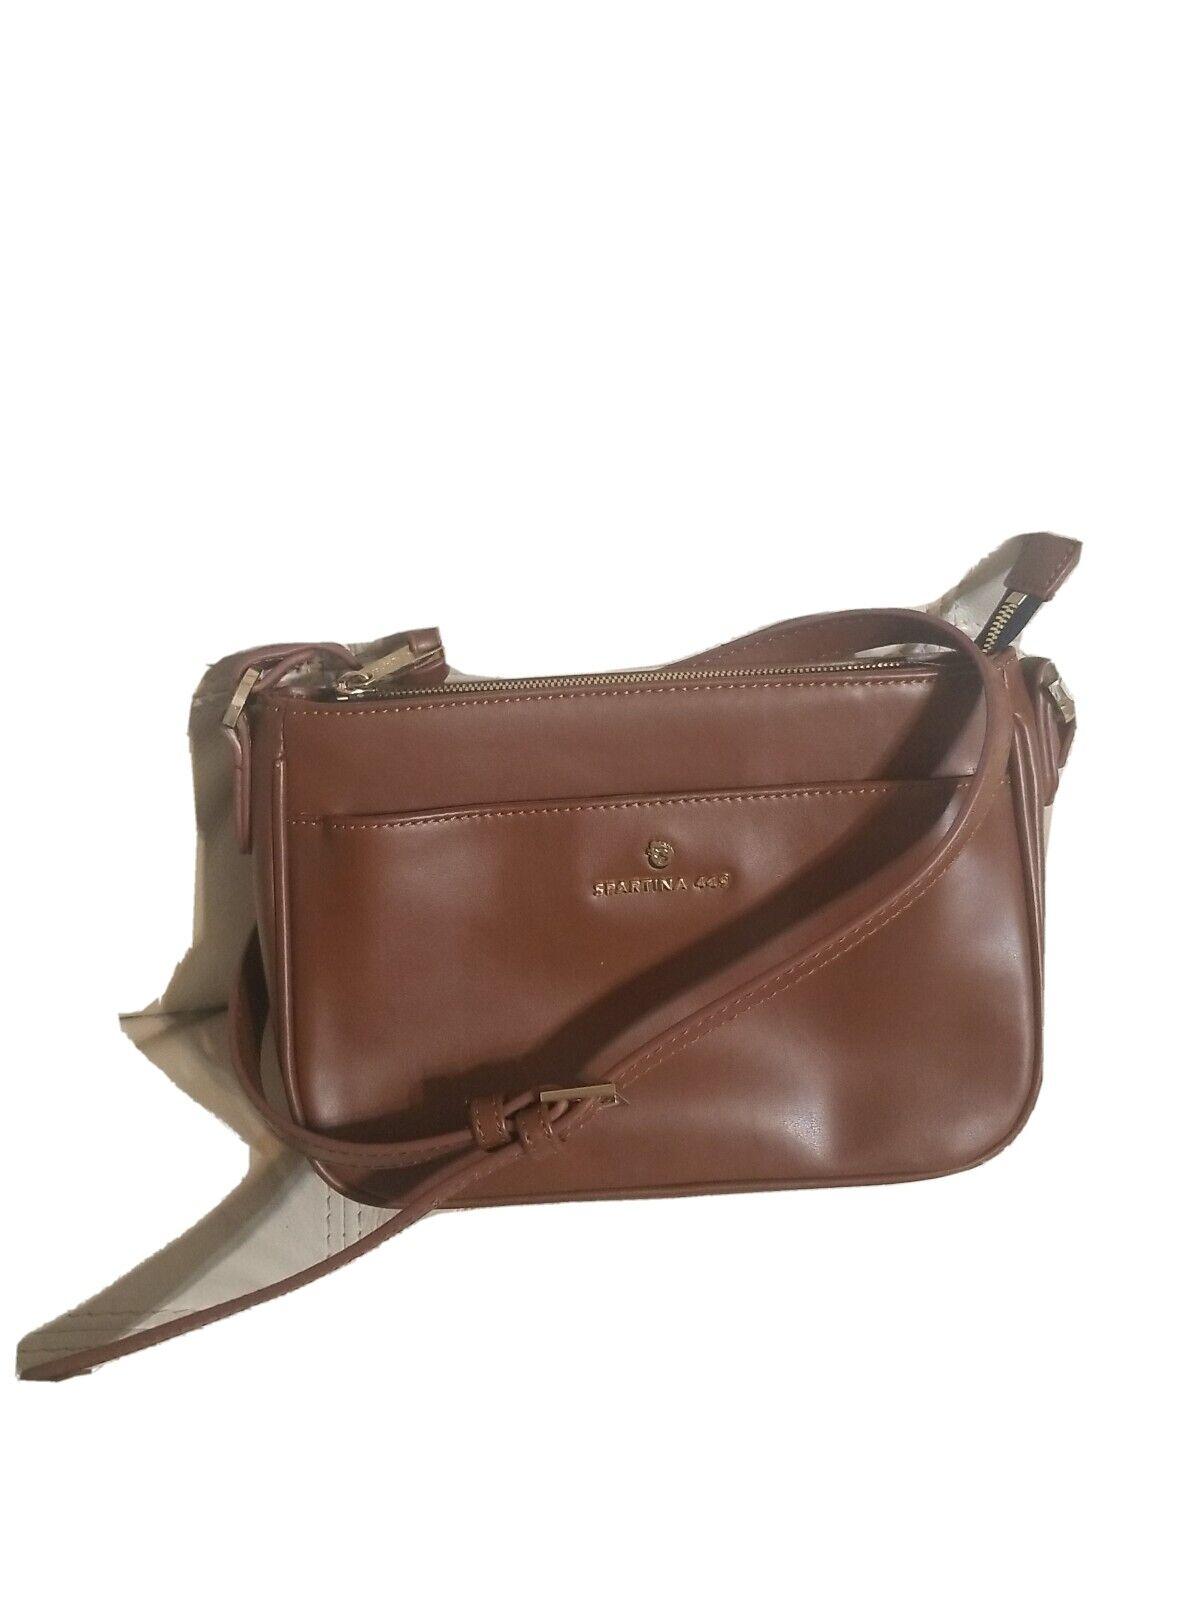 Spartina Bag Crossbody Small Leather Brown Rare!